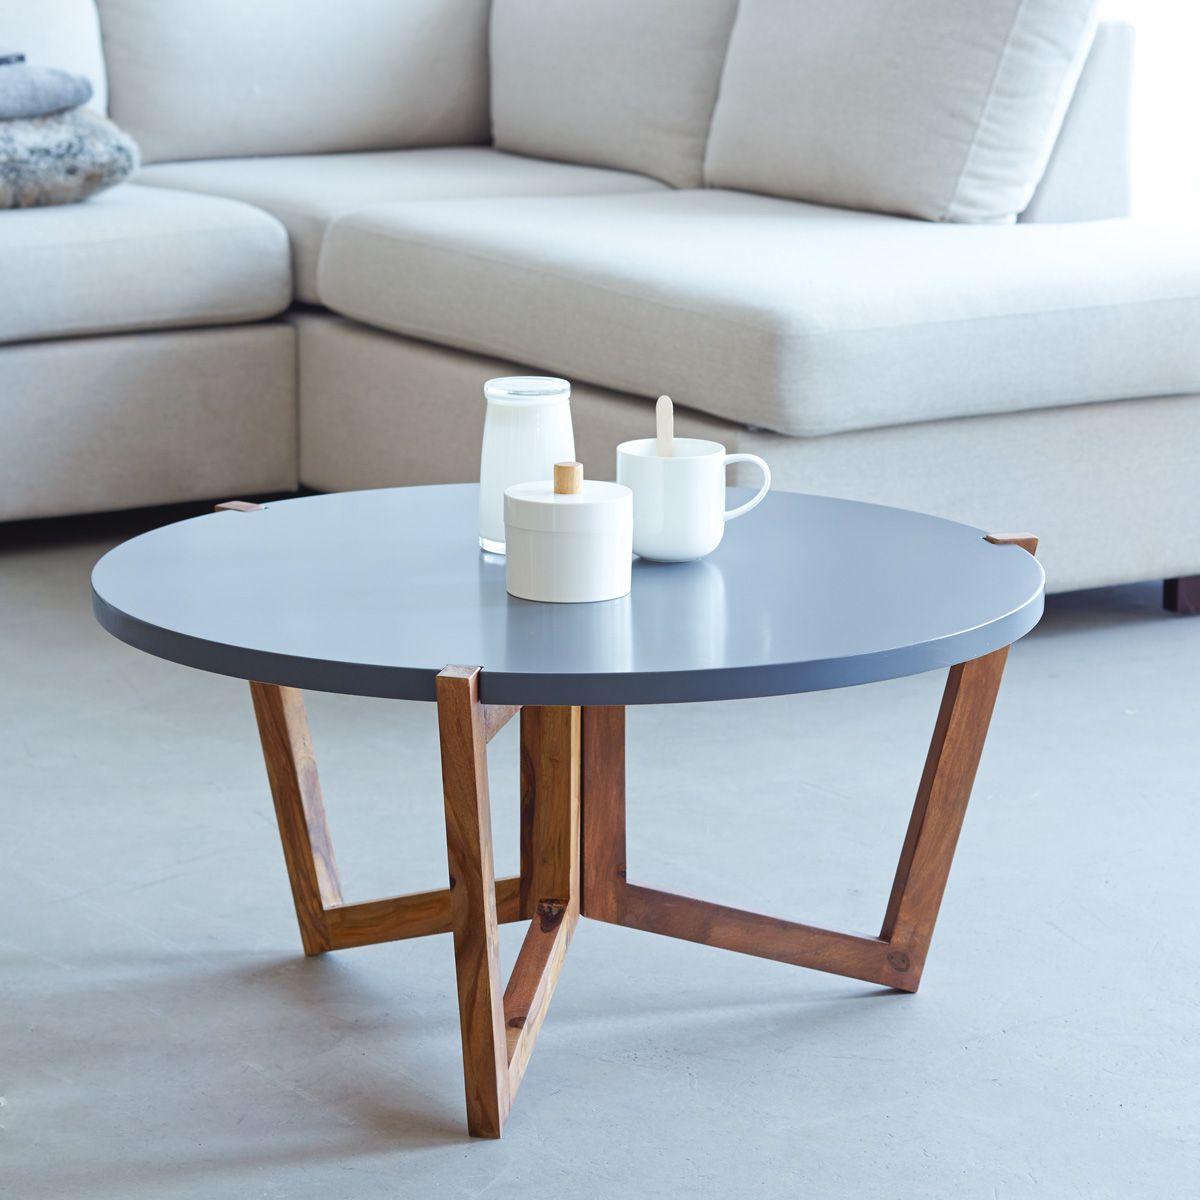 Sheesham Lounge Table Niels 80x80 Coffee Tables Coffee Table Table Tikamoon [ 1200 x 1200 Pixel ]